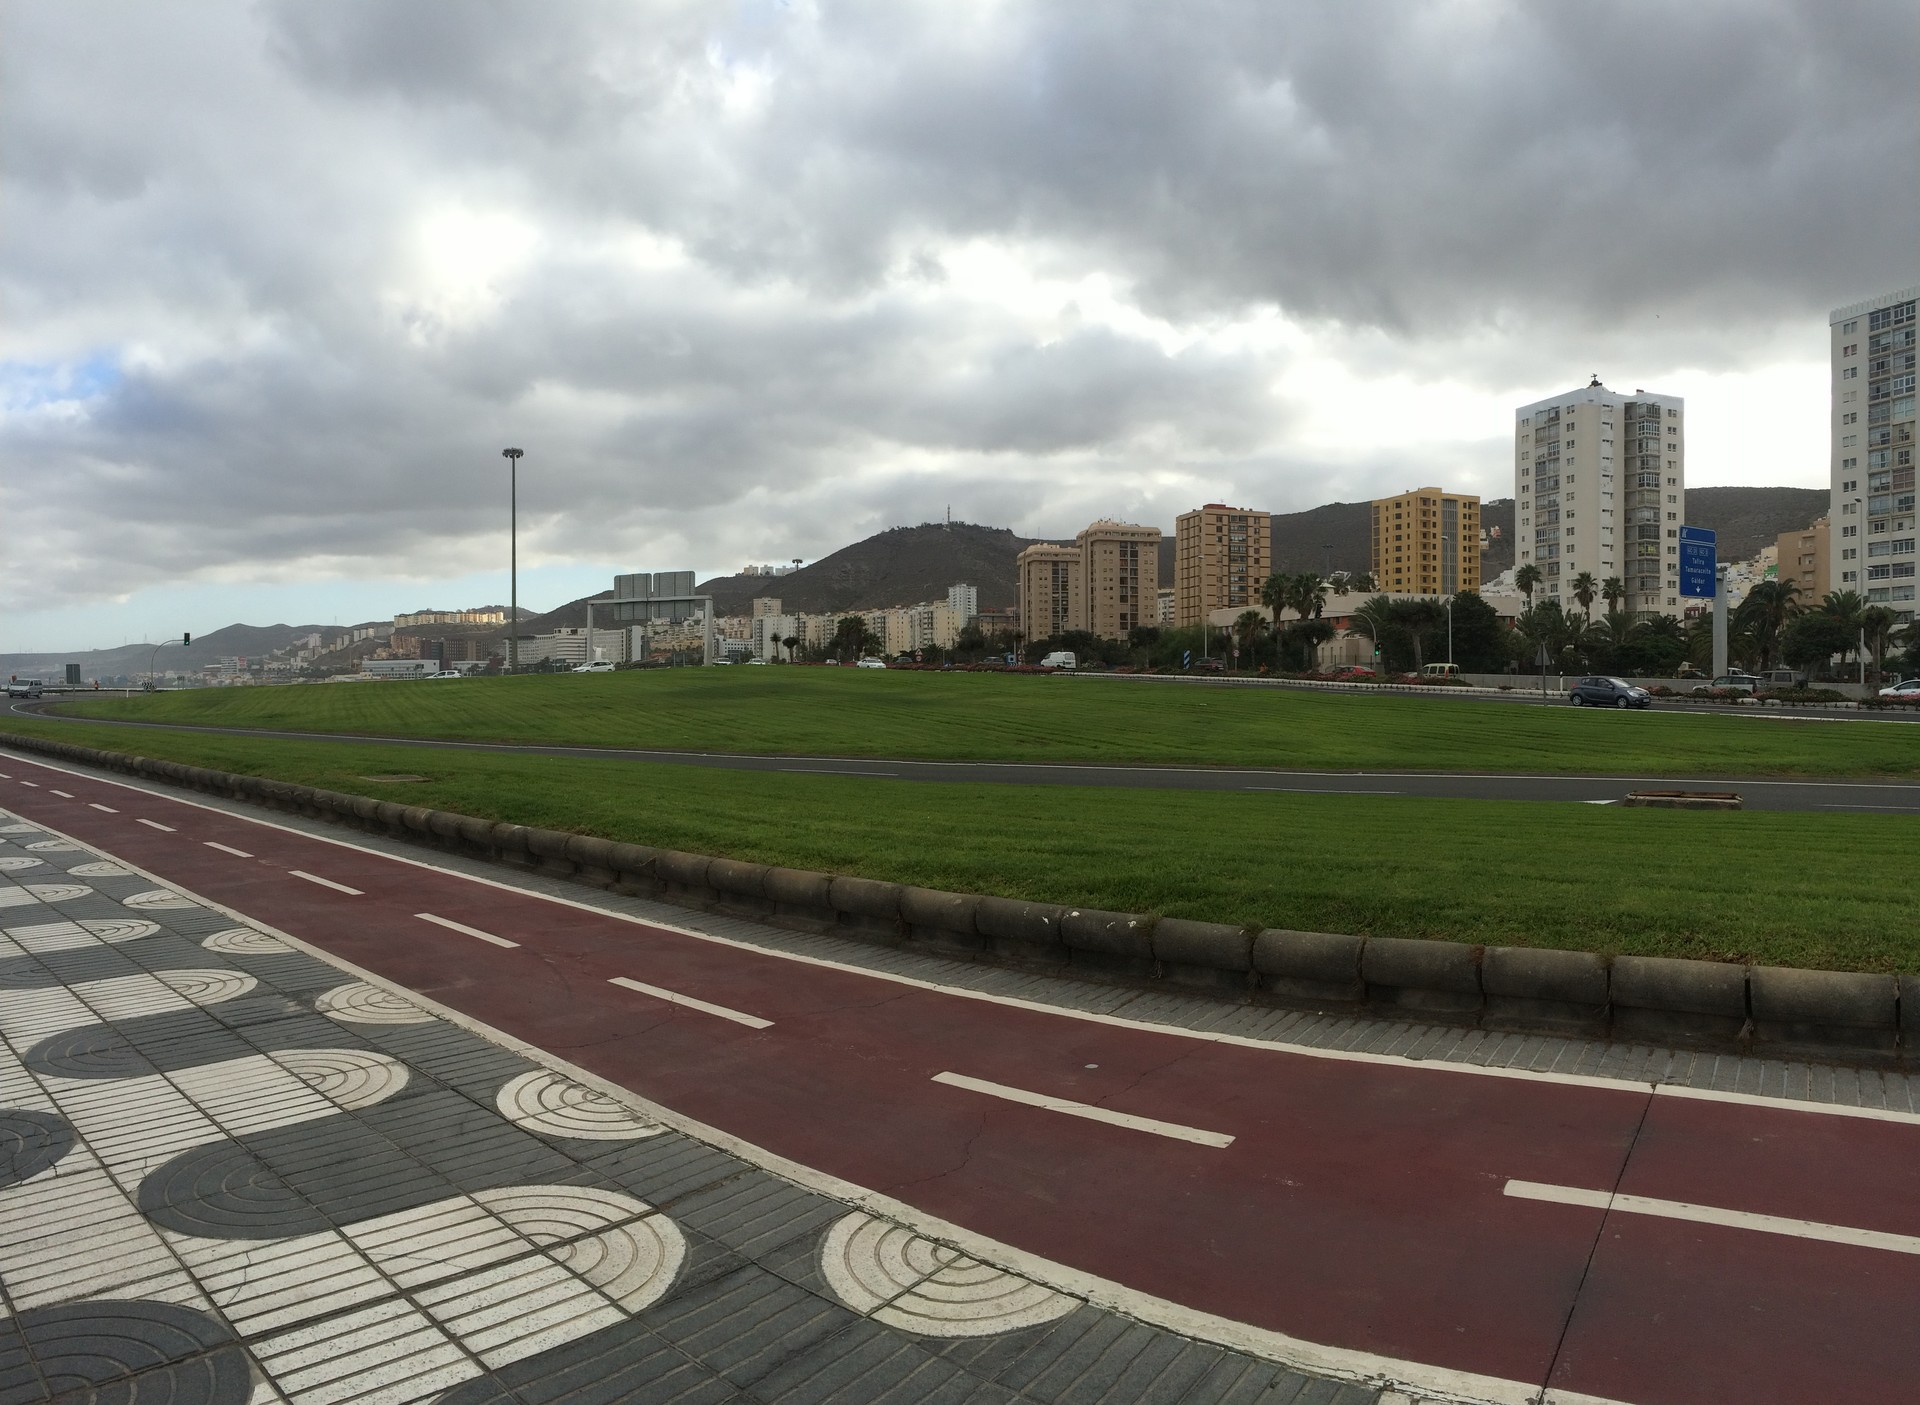 barrio-pesquero-san-cristobal-63457c169c